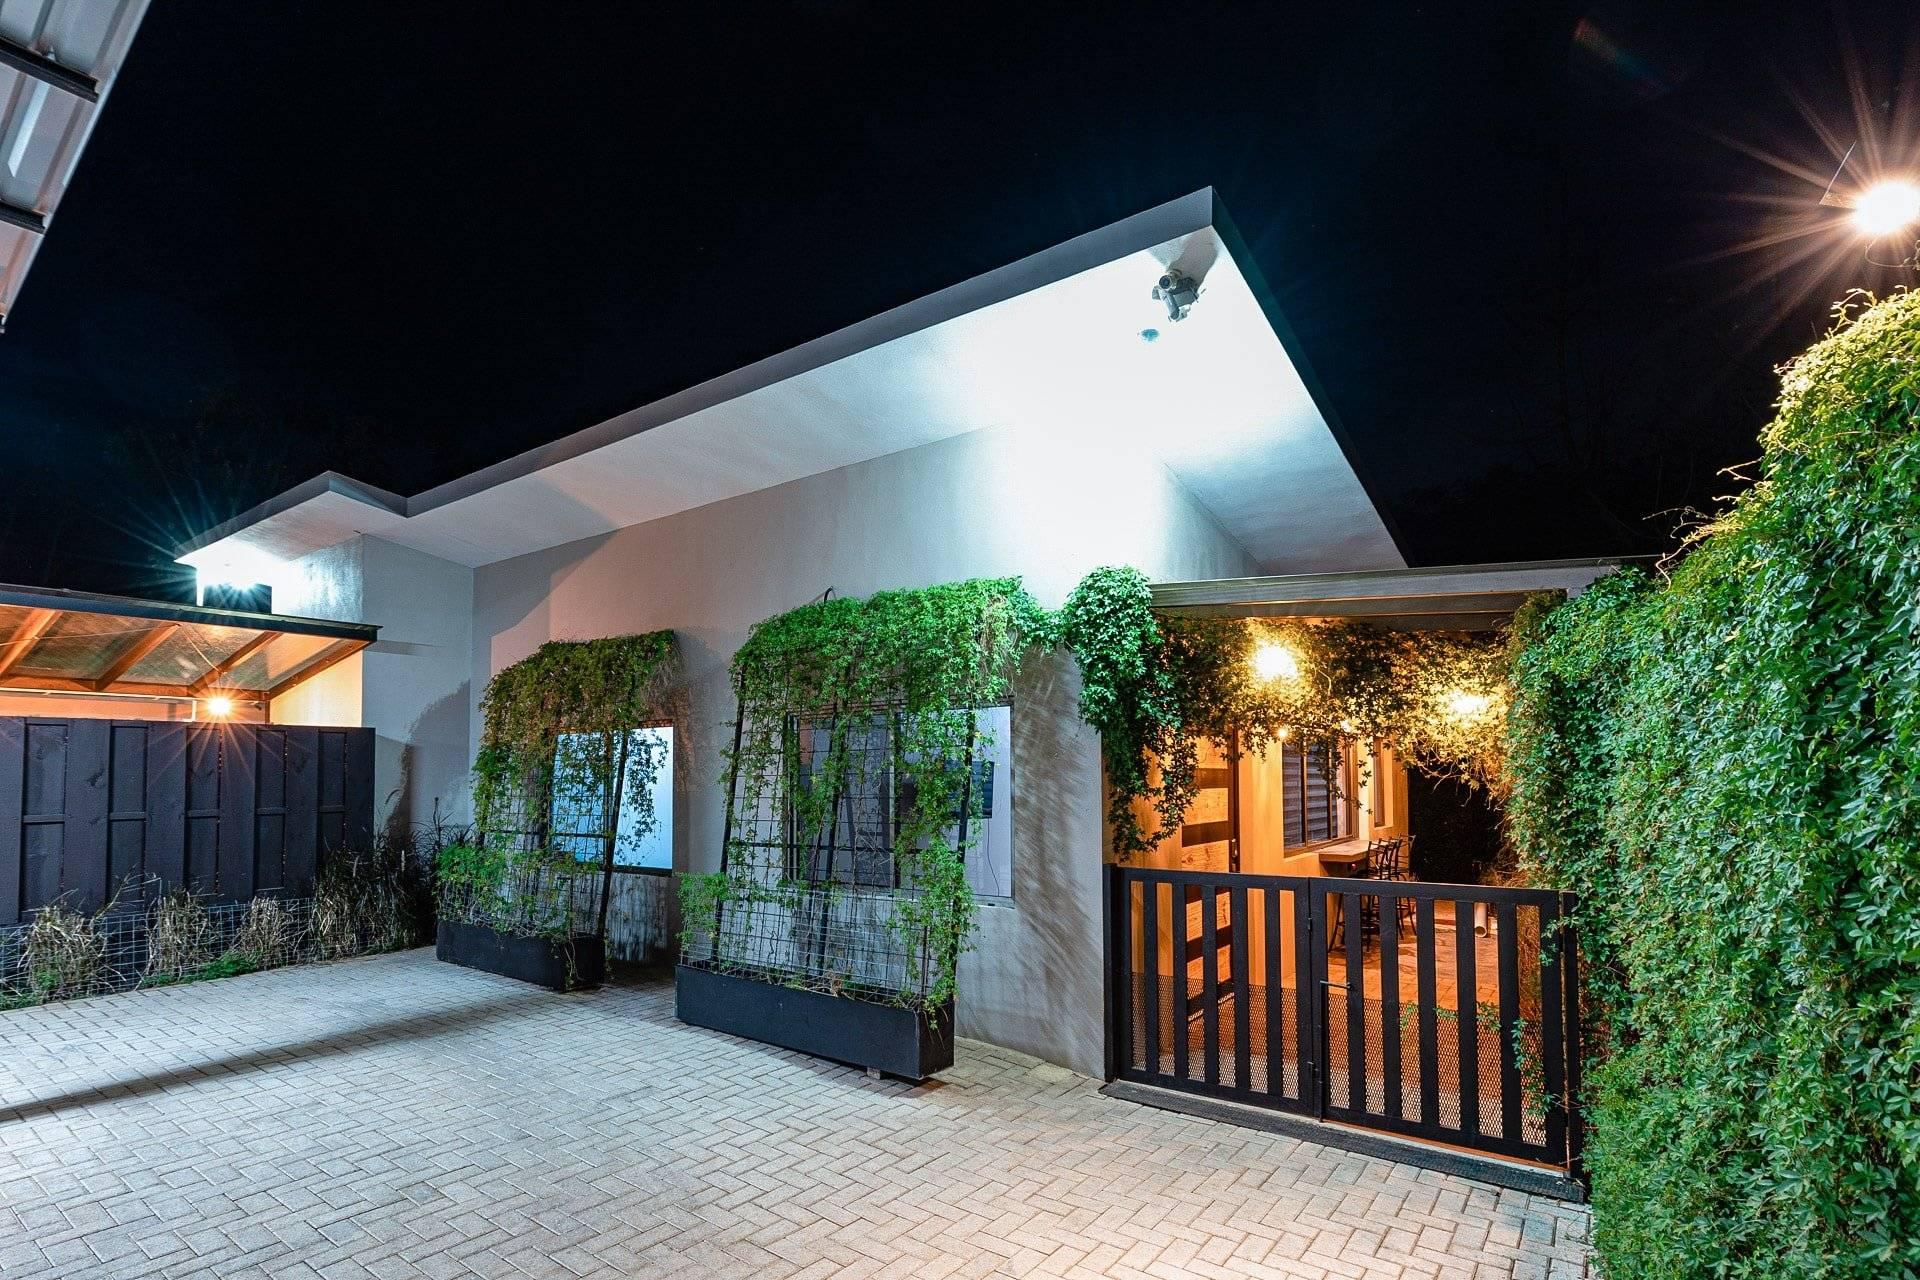 Casa Colibri private properties of Costa Rica